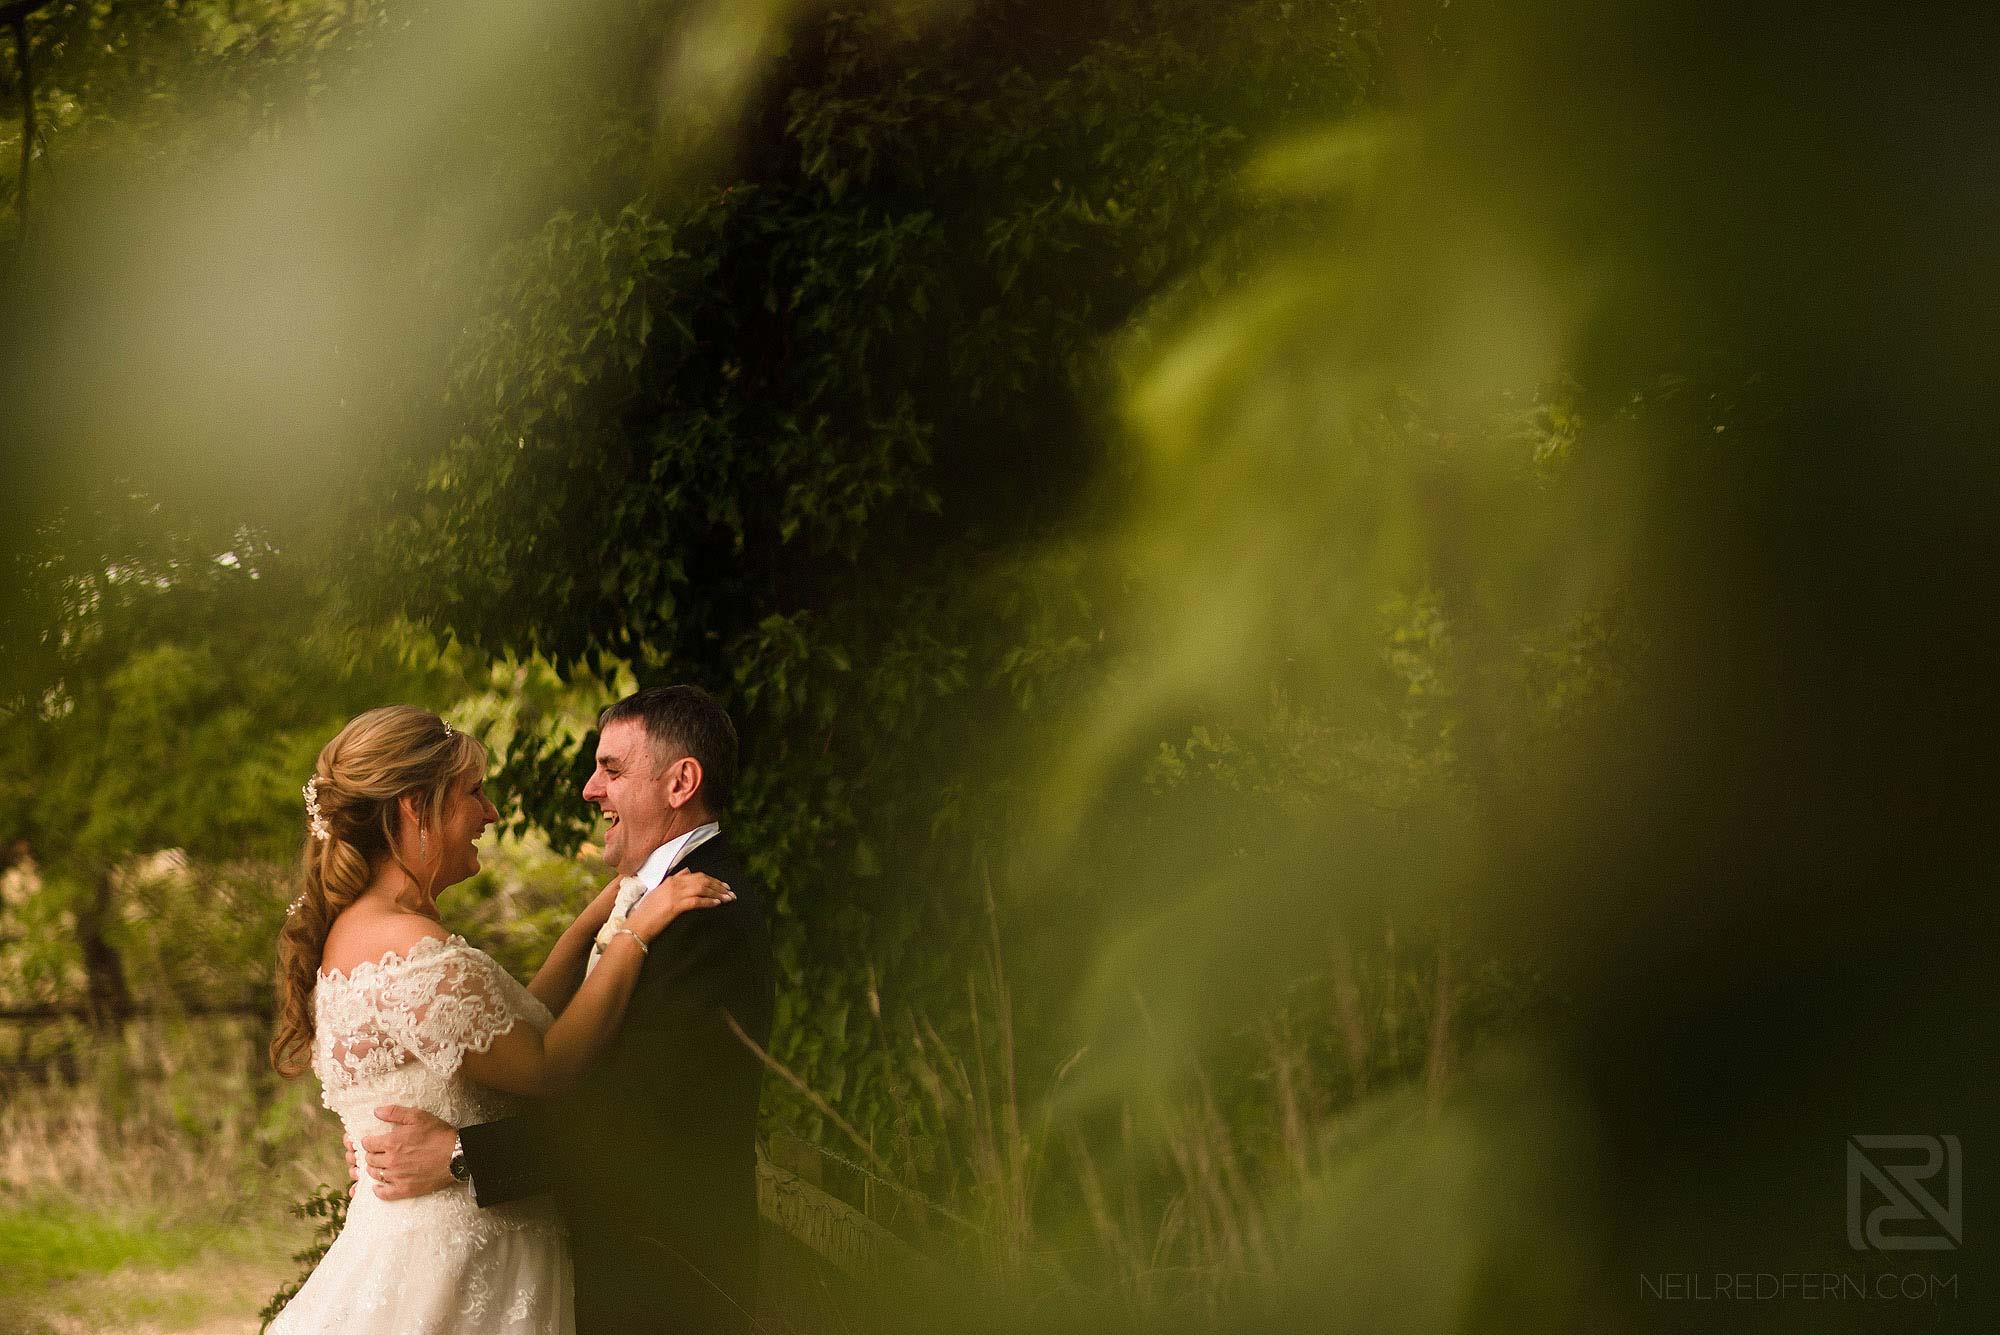 bride and groom portrait at The Villa Wrea Green in Lancashire